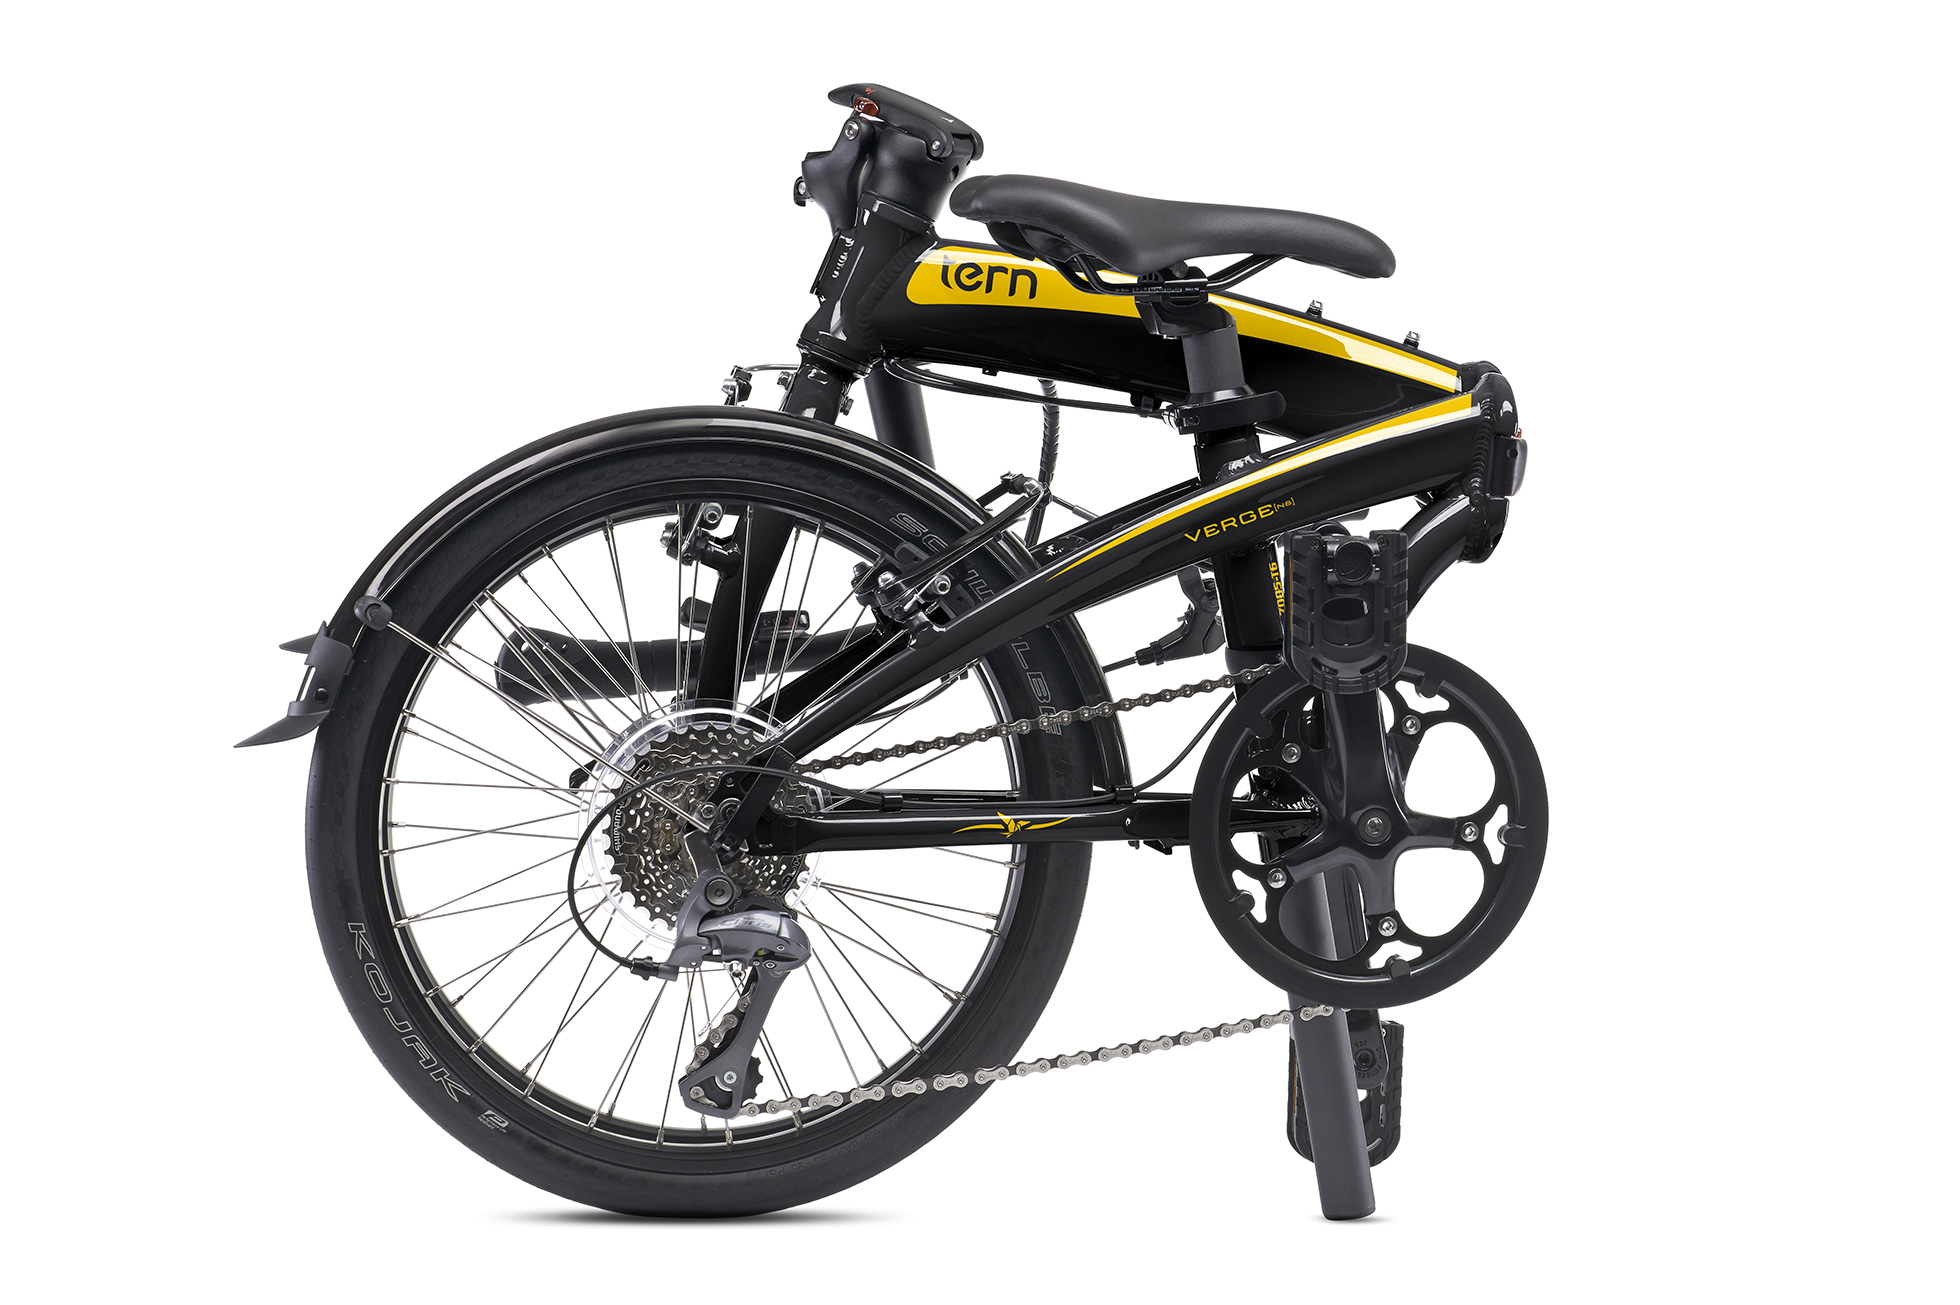 Verge N8 Tern Folding Bikes Philippines